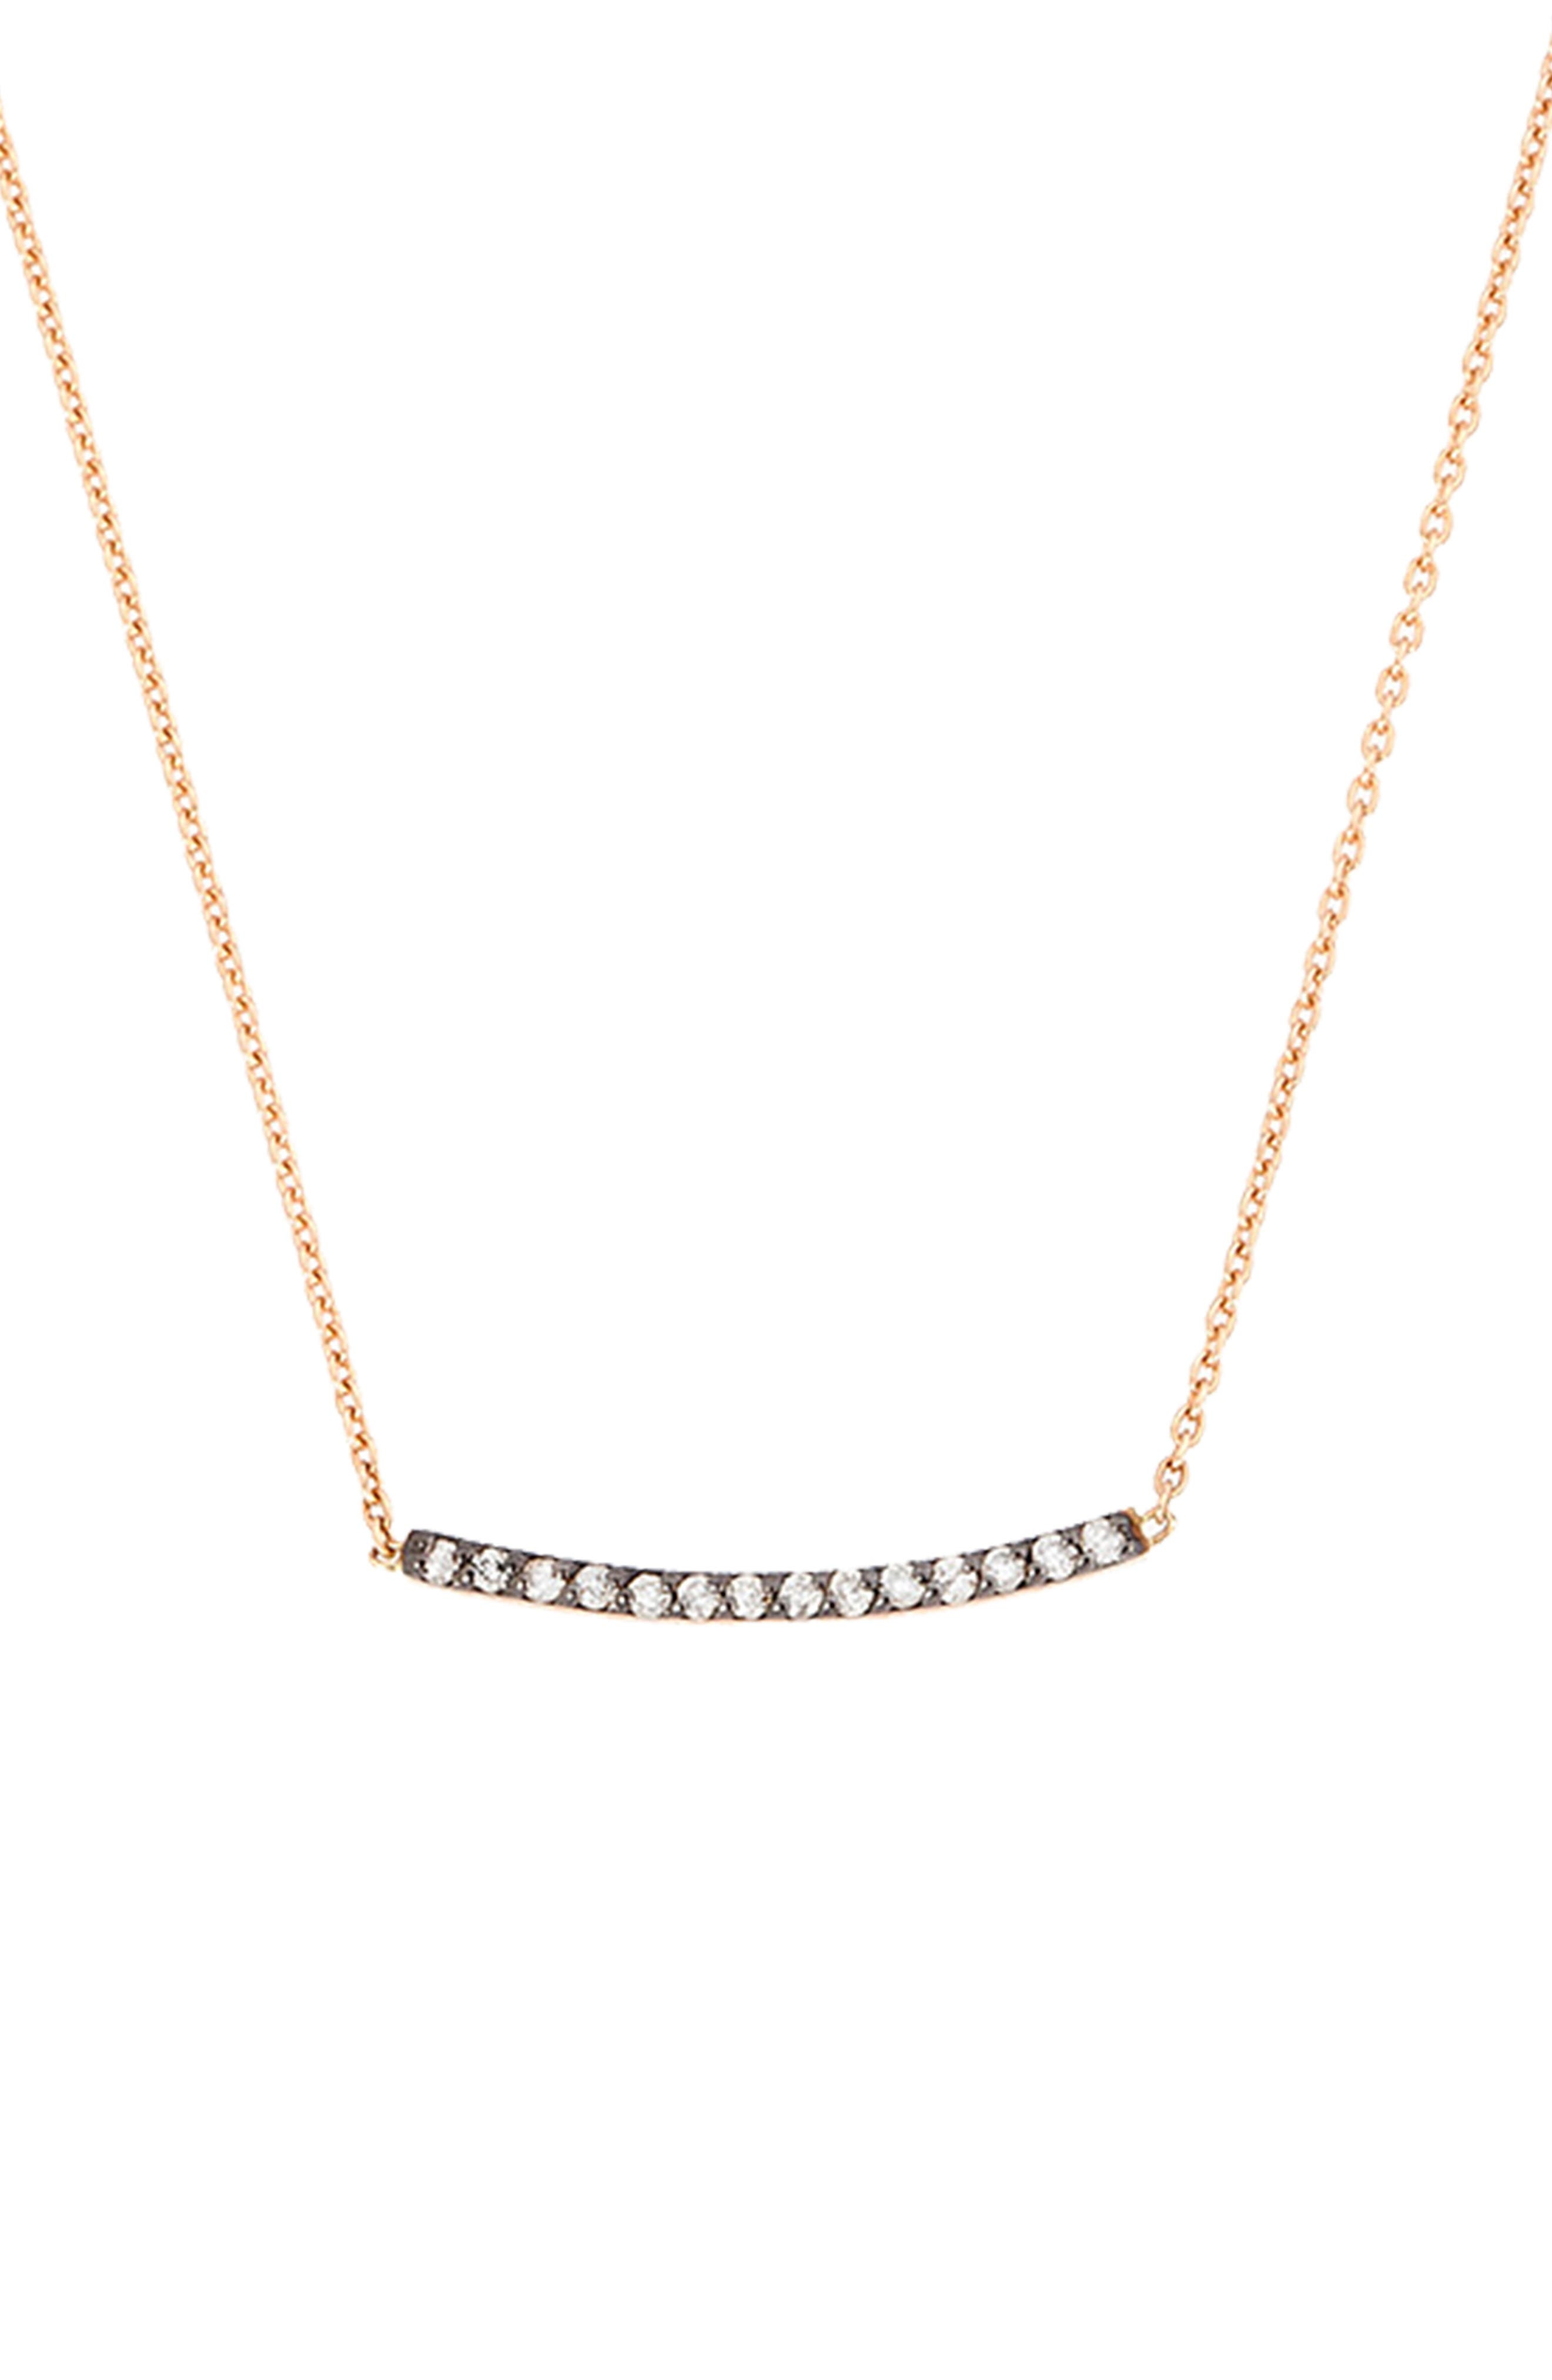 Diamond Bar Necklace,                             Main thumbnail 1, color,                             ROSE GOLD